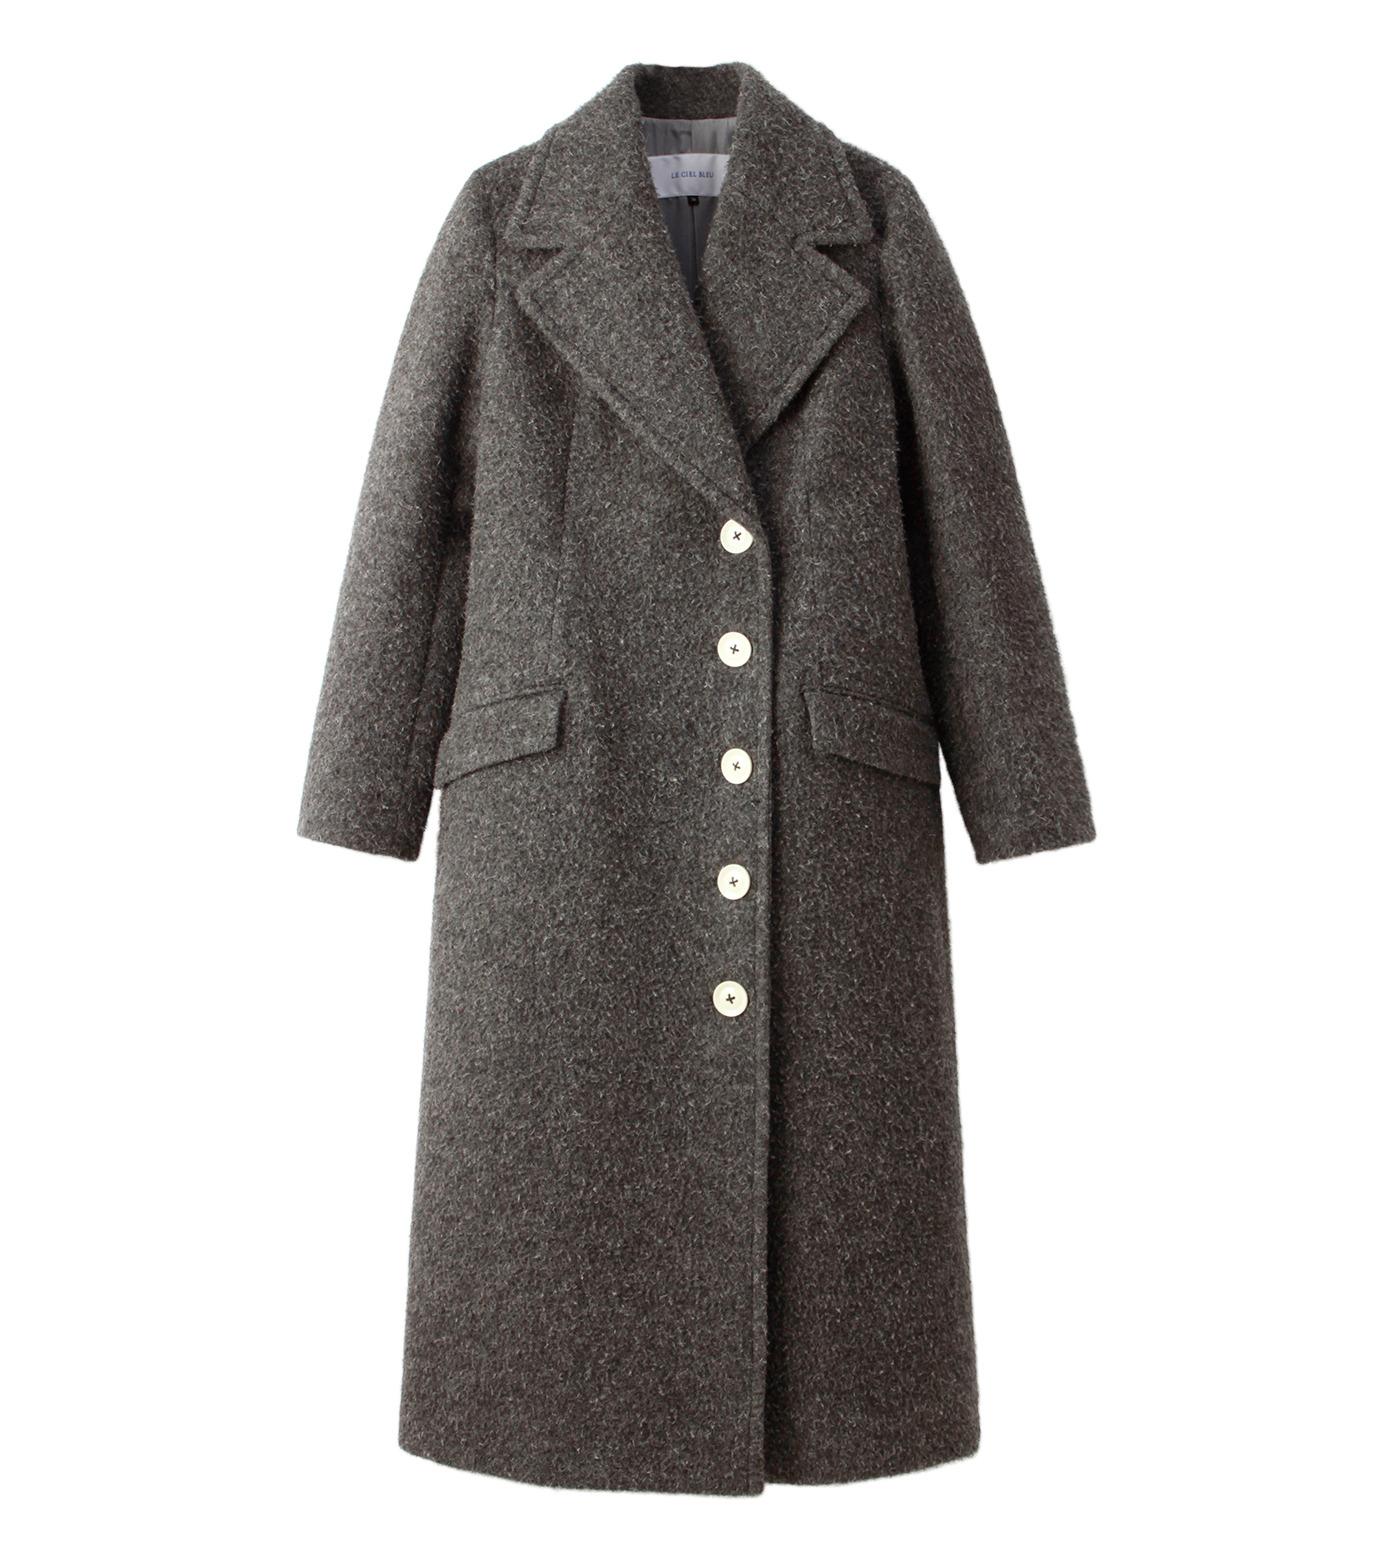 LE CIEL BLEU(ルシェルブルー)のハードナッピングレディシルエットコート-GRAY(コート/coat)-18A69402 拡大詳細画像4